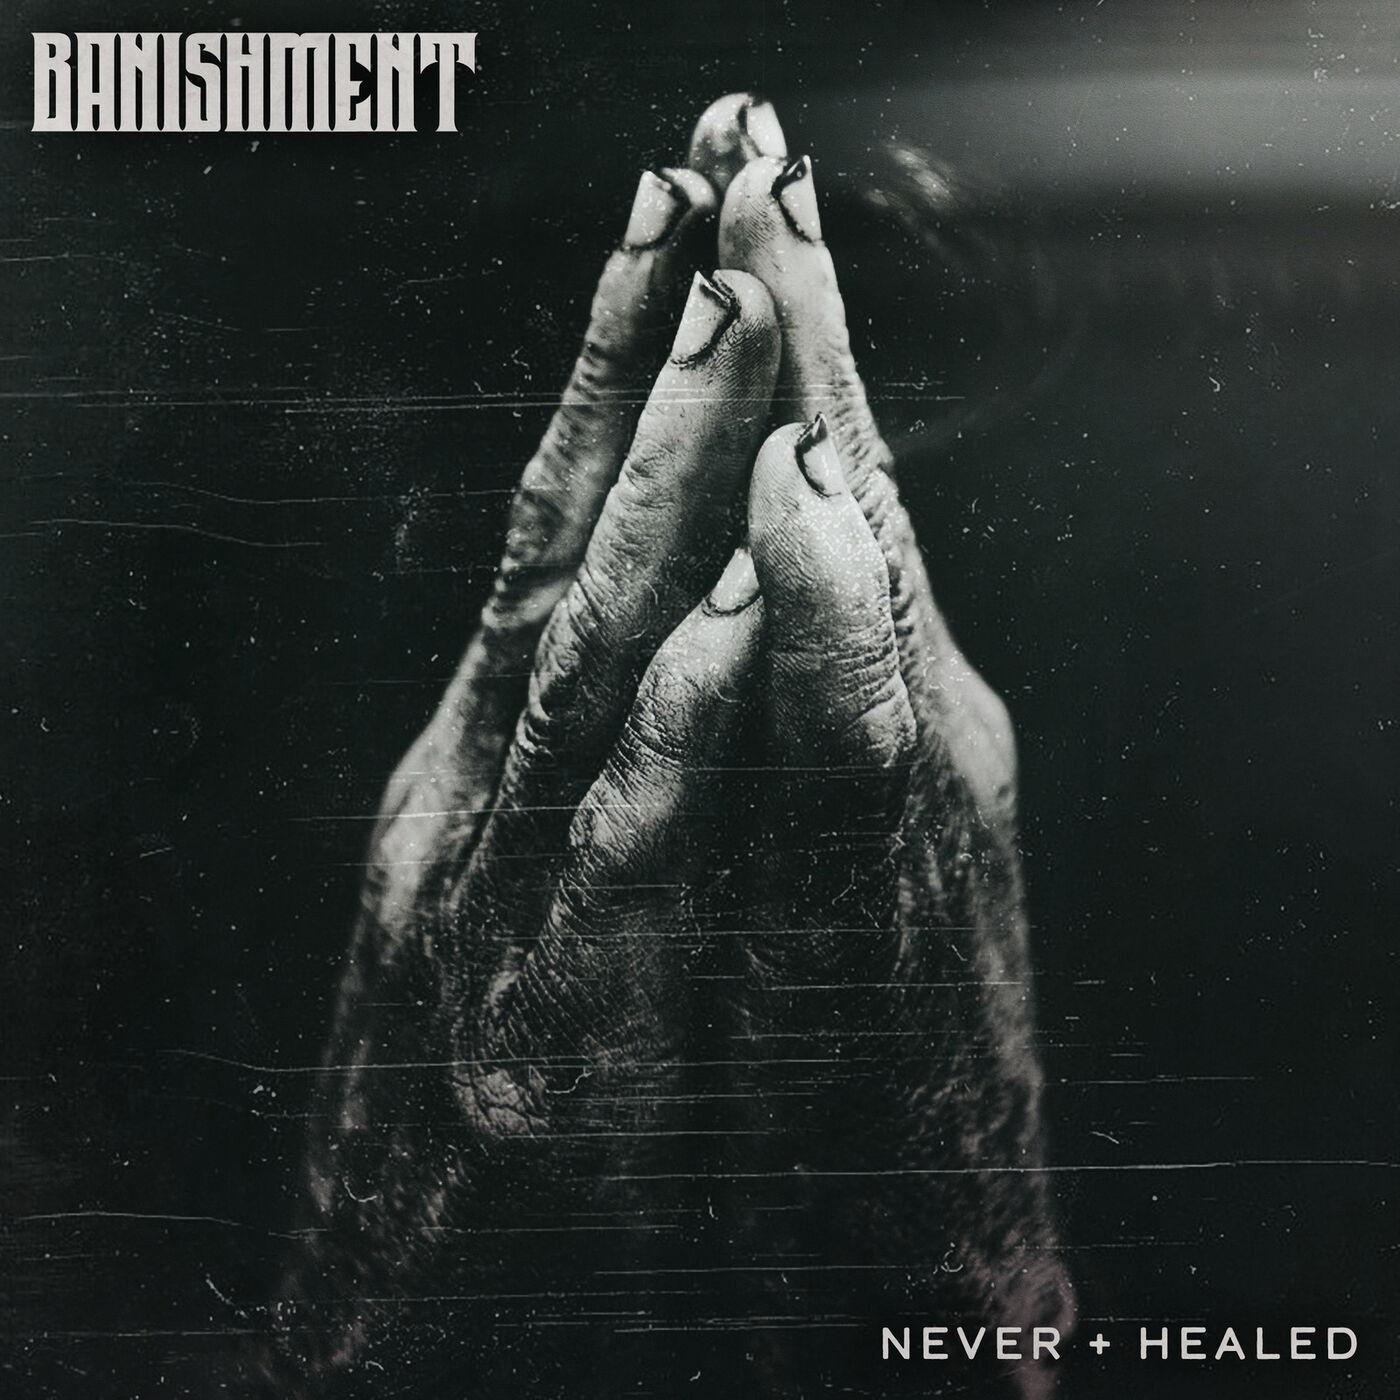 Banishment - Never + Healed [EP] (2019)